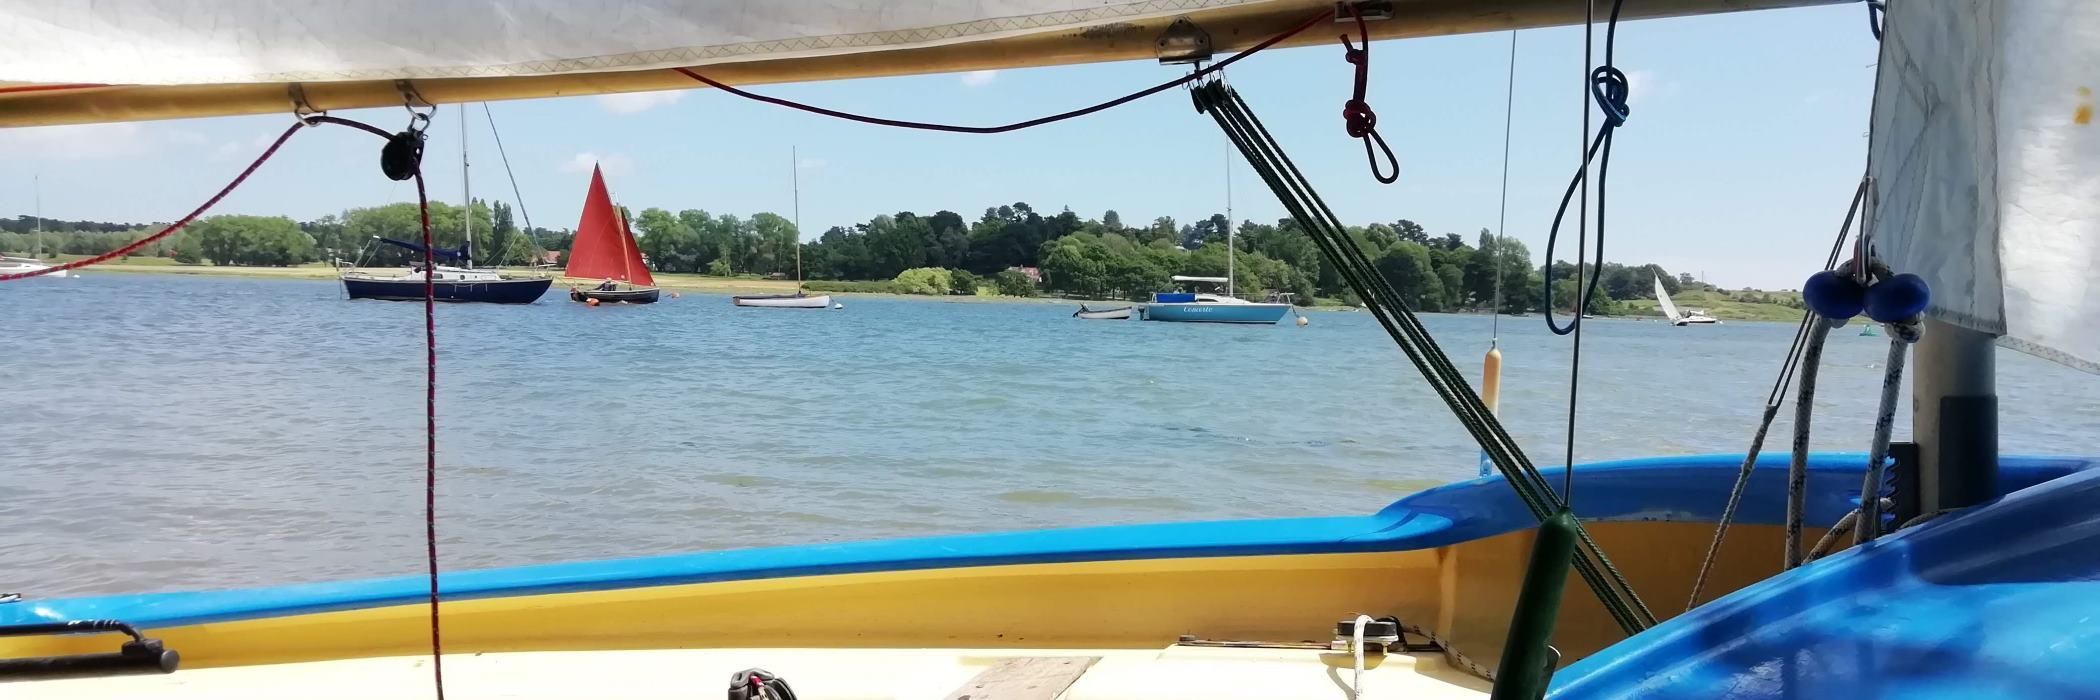 Waldringfield-Sailing-river-deben-4